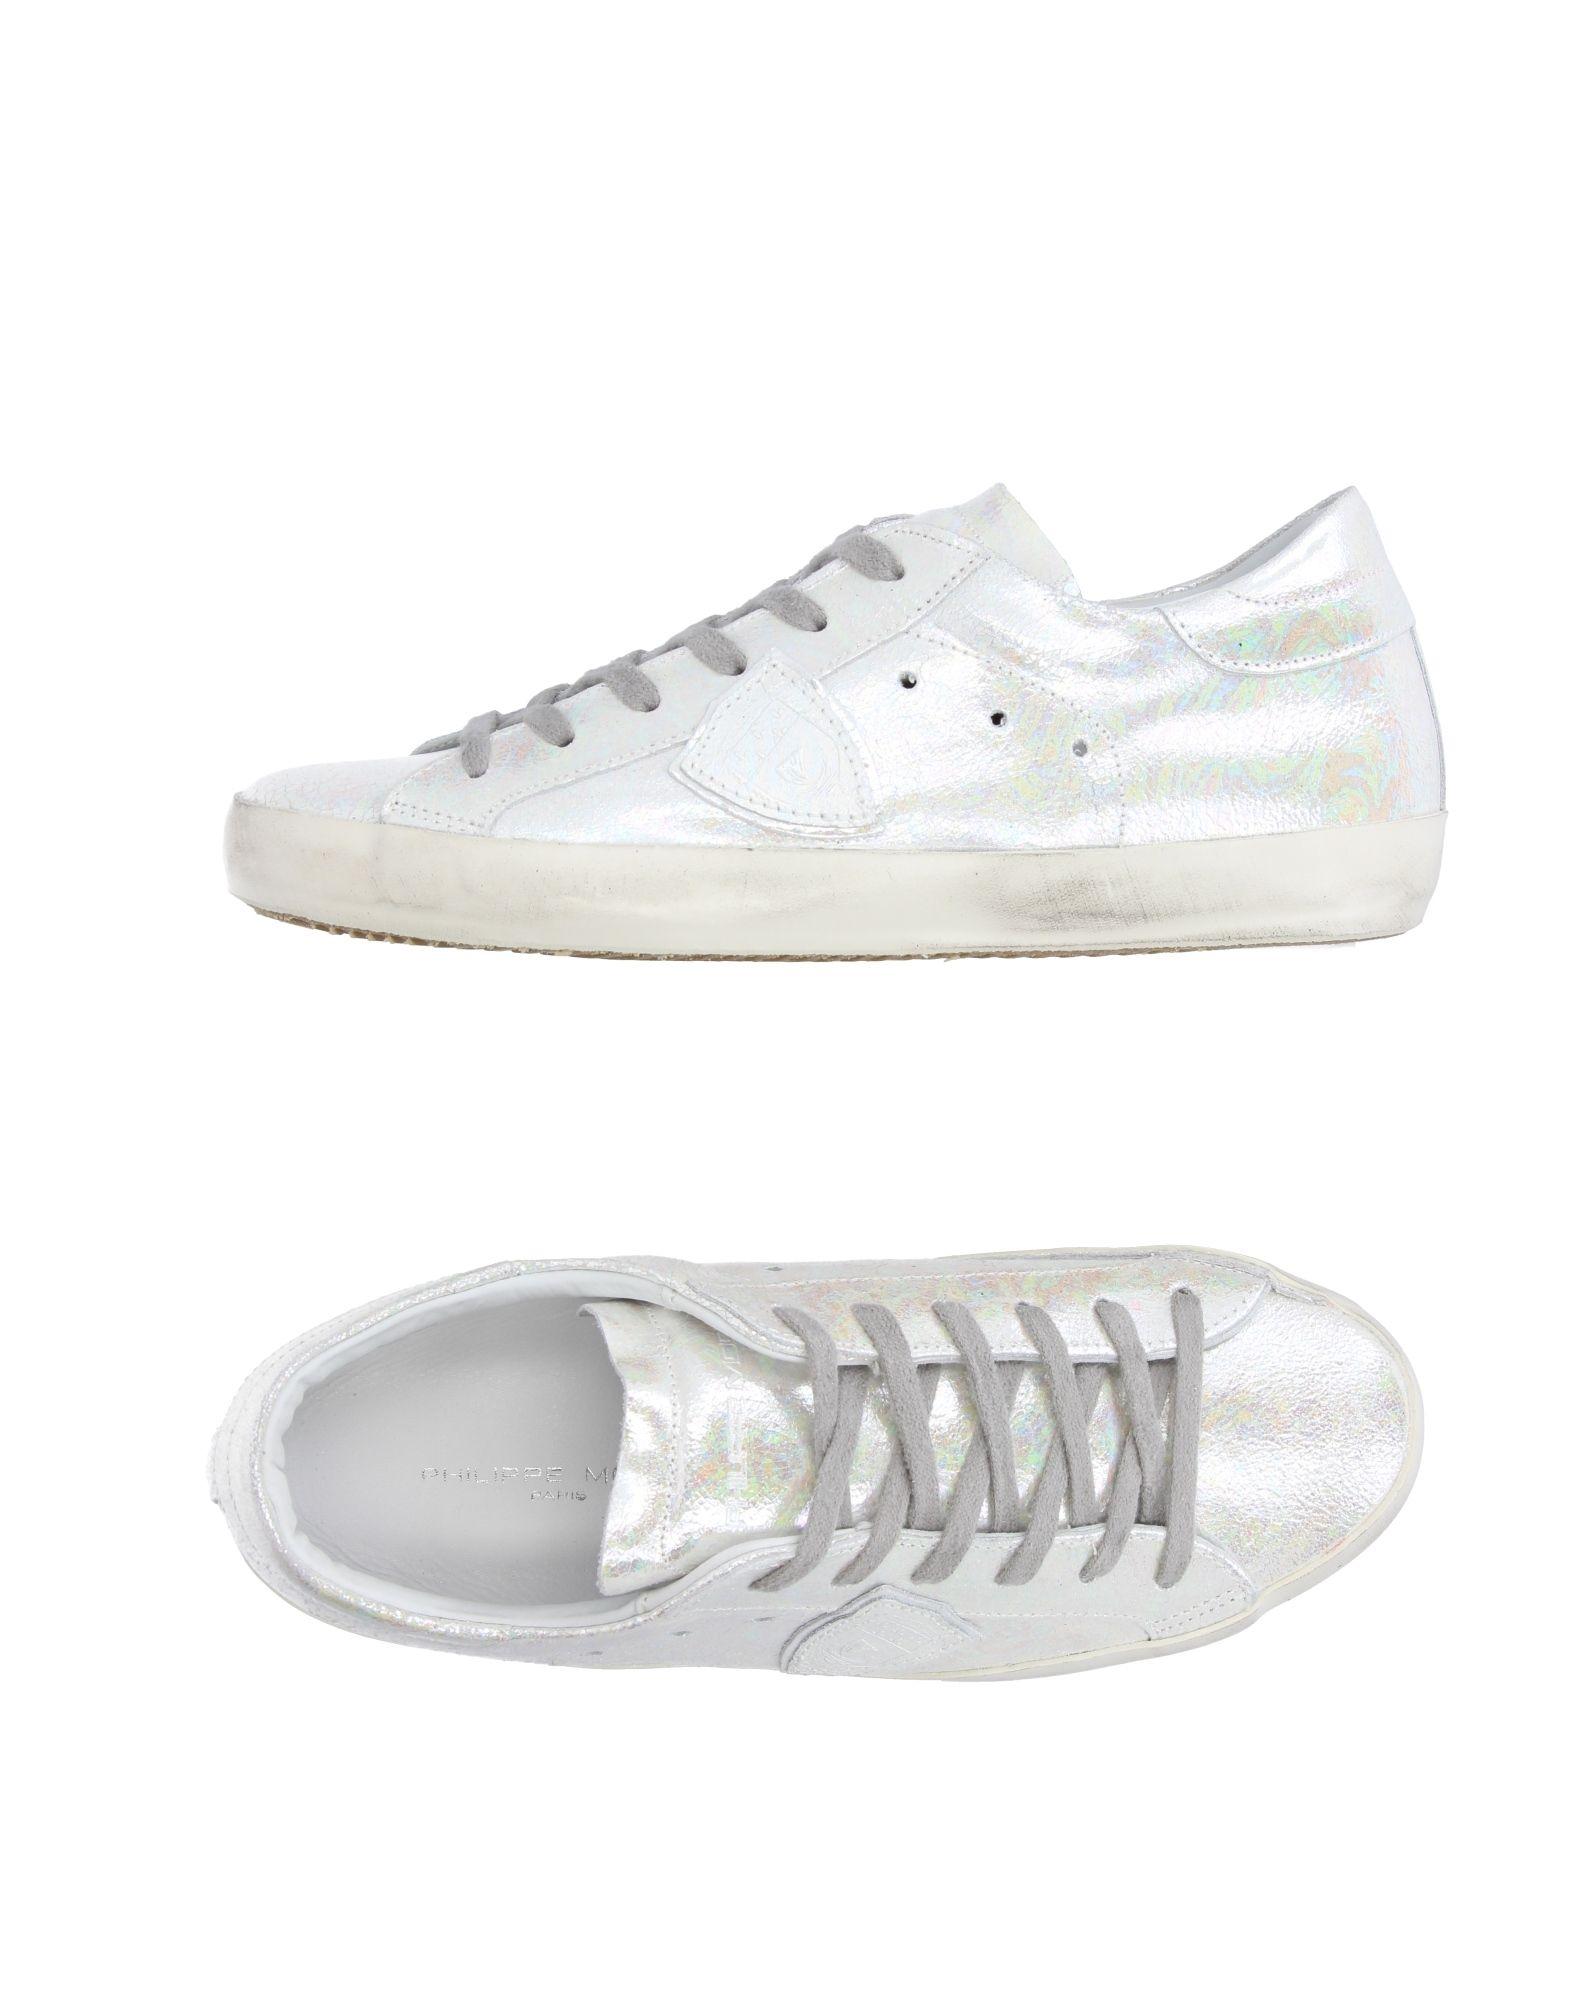 Philippe Model Sneakers - Women Philippe Model Sneakers Sneakers Sneakers online on  United Kingdom - 11211929QX 52746d